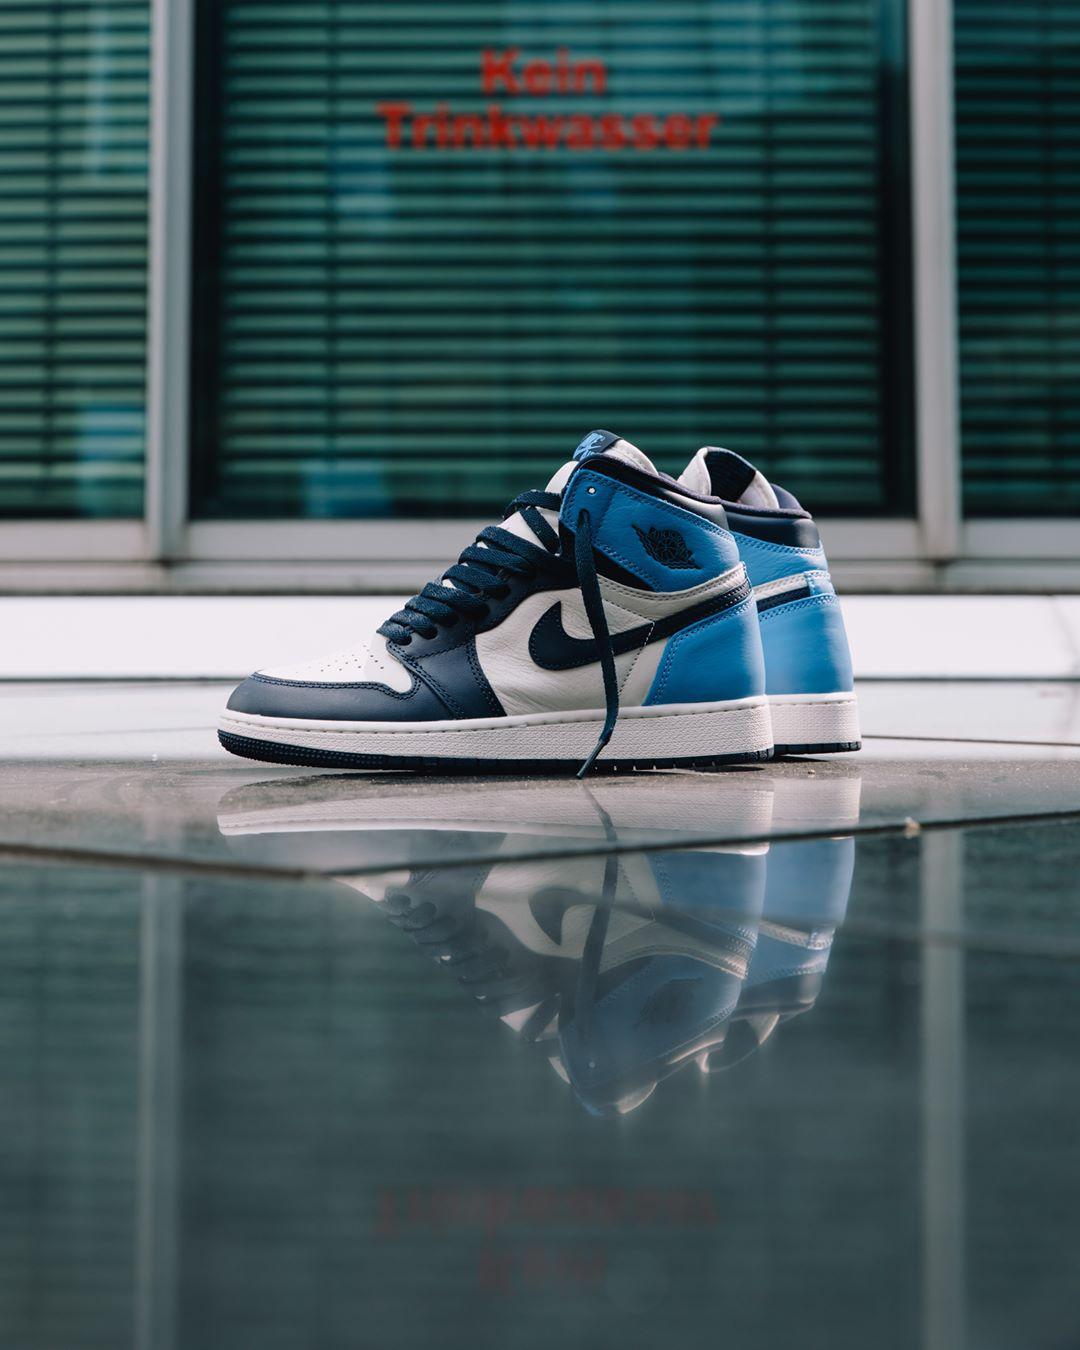 Air-Jordan-1-Retro-High-OG-Obsidian-UNC-5 - Sneaker Myth